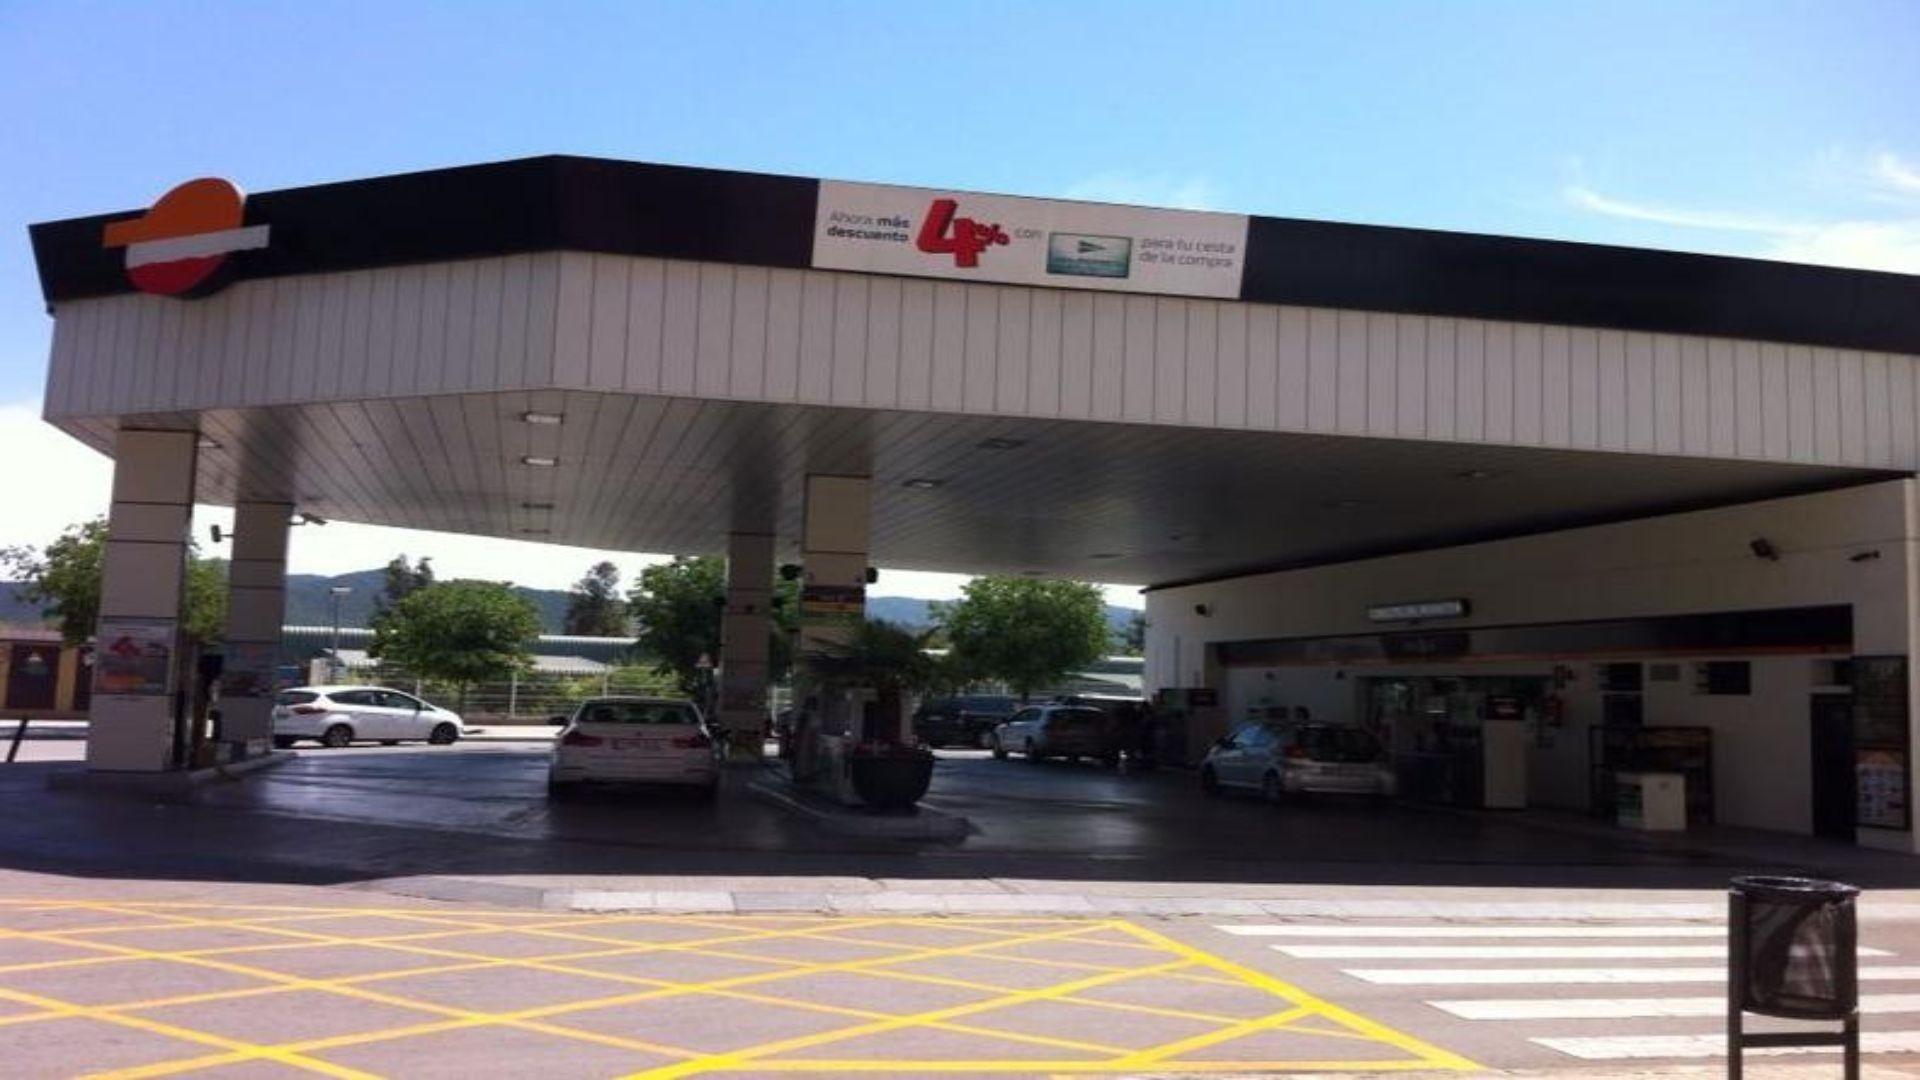 Gasolinera en Mollet del Valles